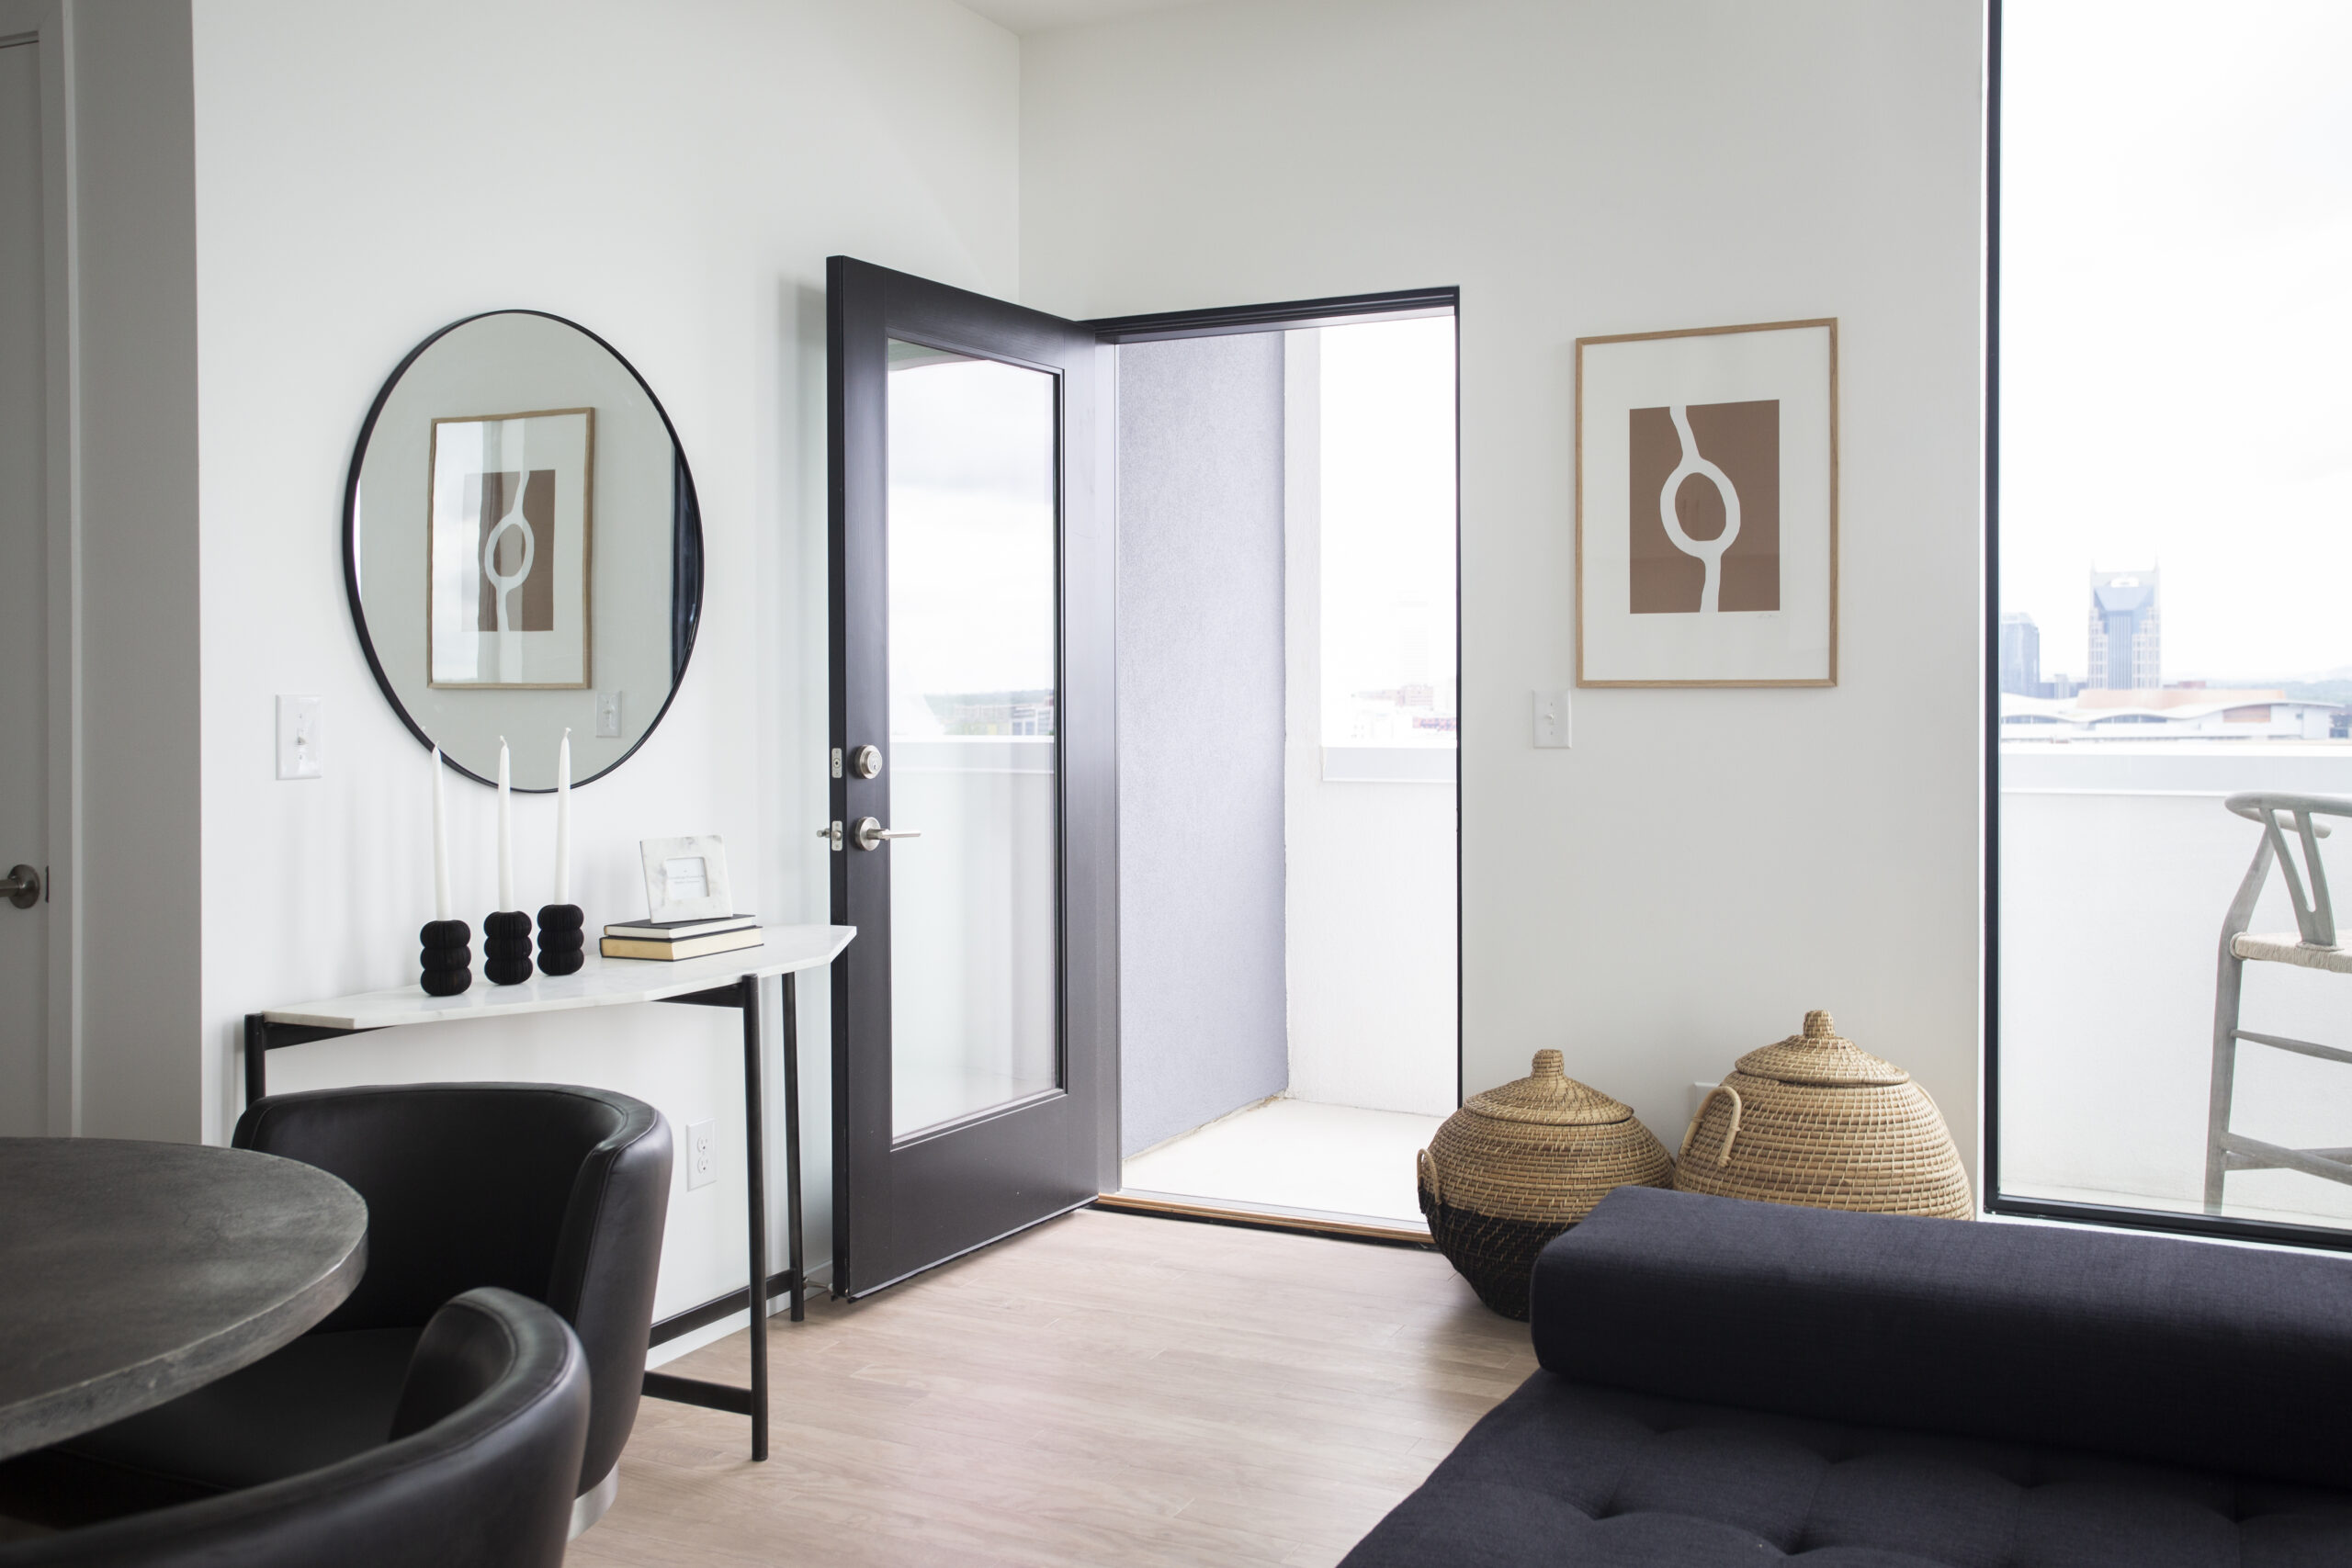 62-Mayker-Interiors-Home-Staging-Furniture-Rentals-Modern-Design-Decor-Nashville-Alina-Model-Unit